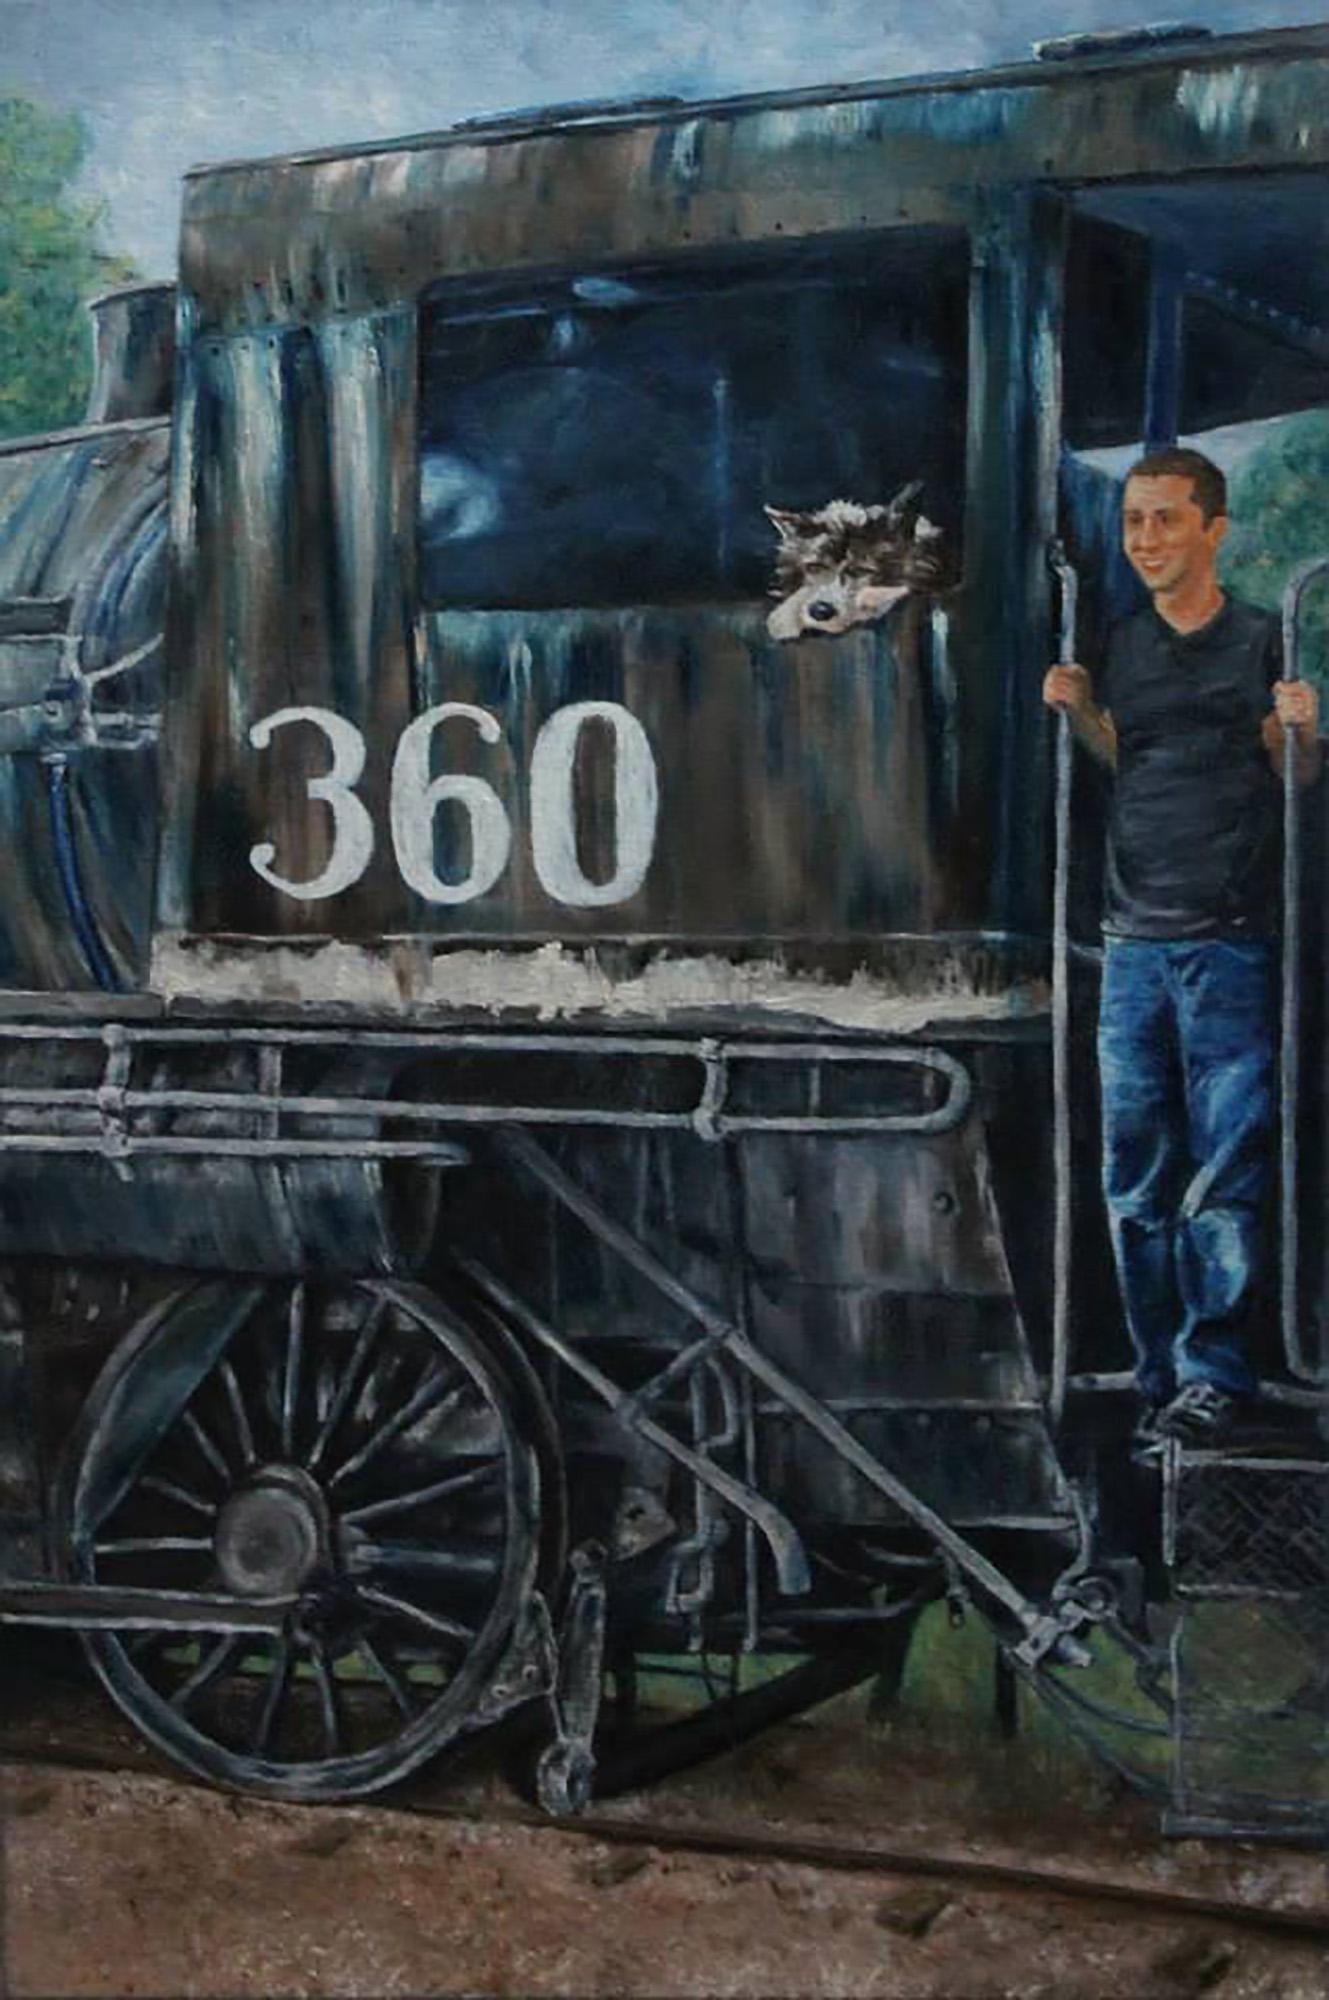 Number 360